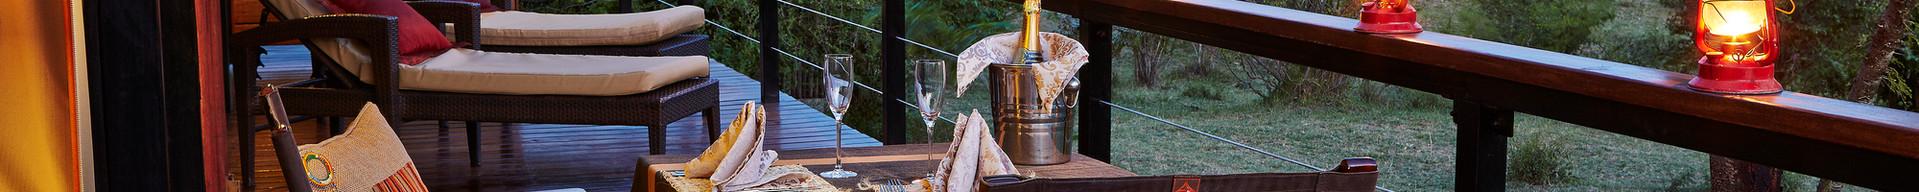 Dinner- Olare Mara Kempinski.jpg